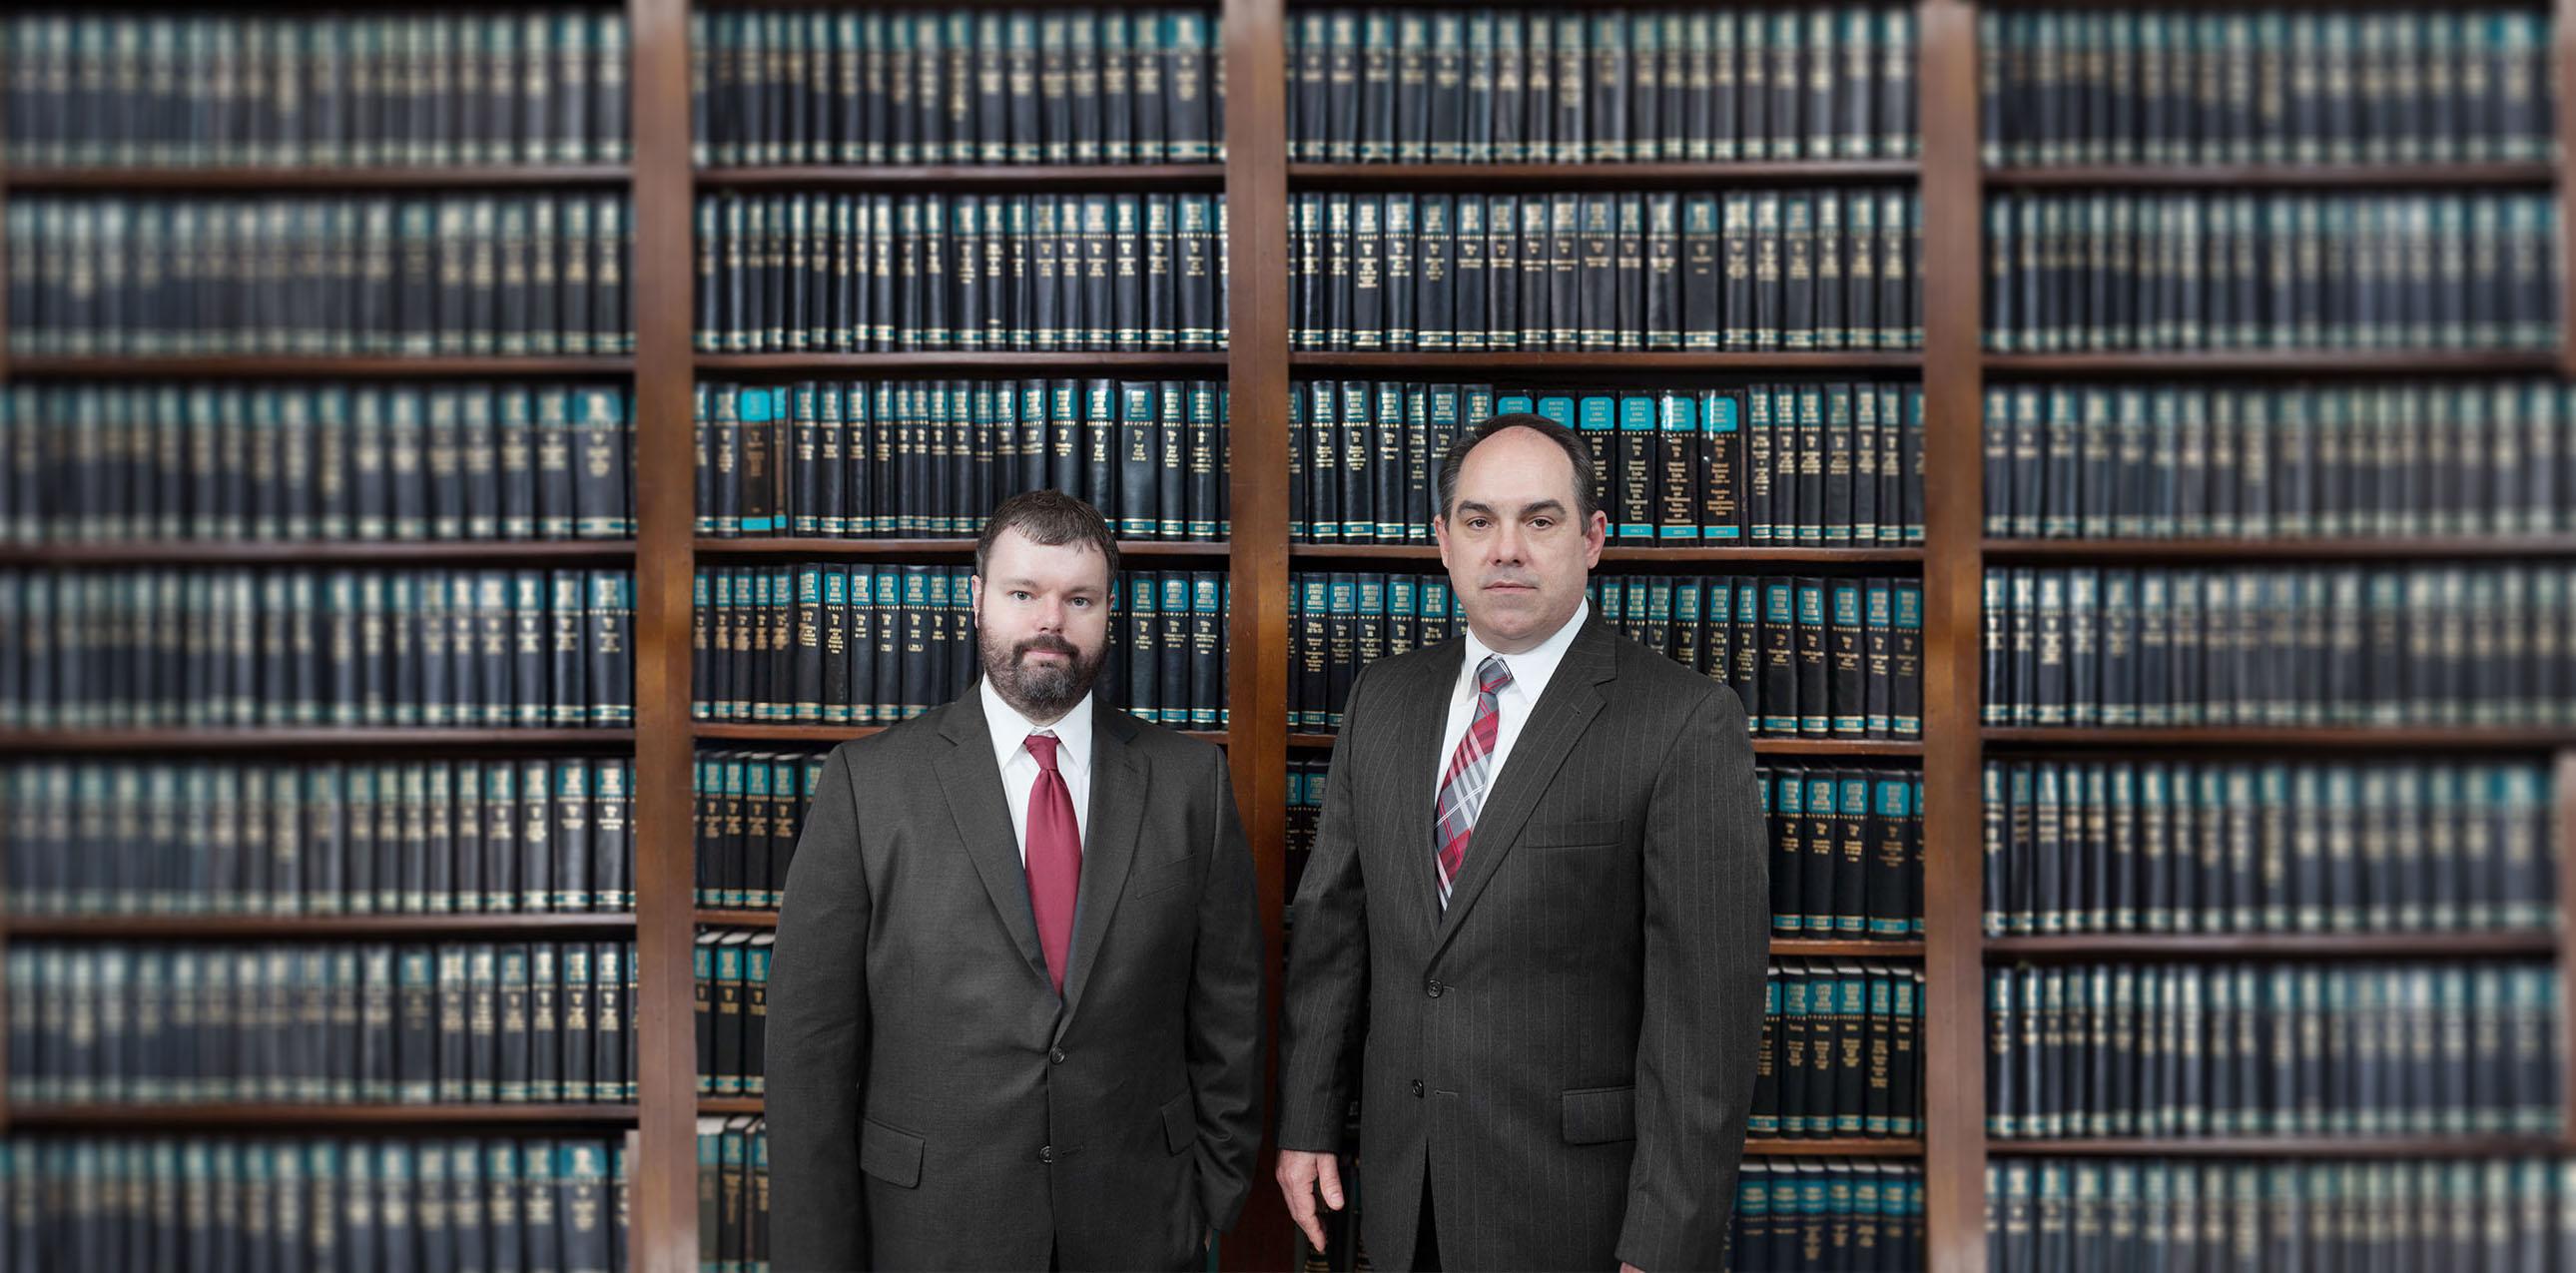 Attorneys in Gadsden, Alabama